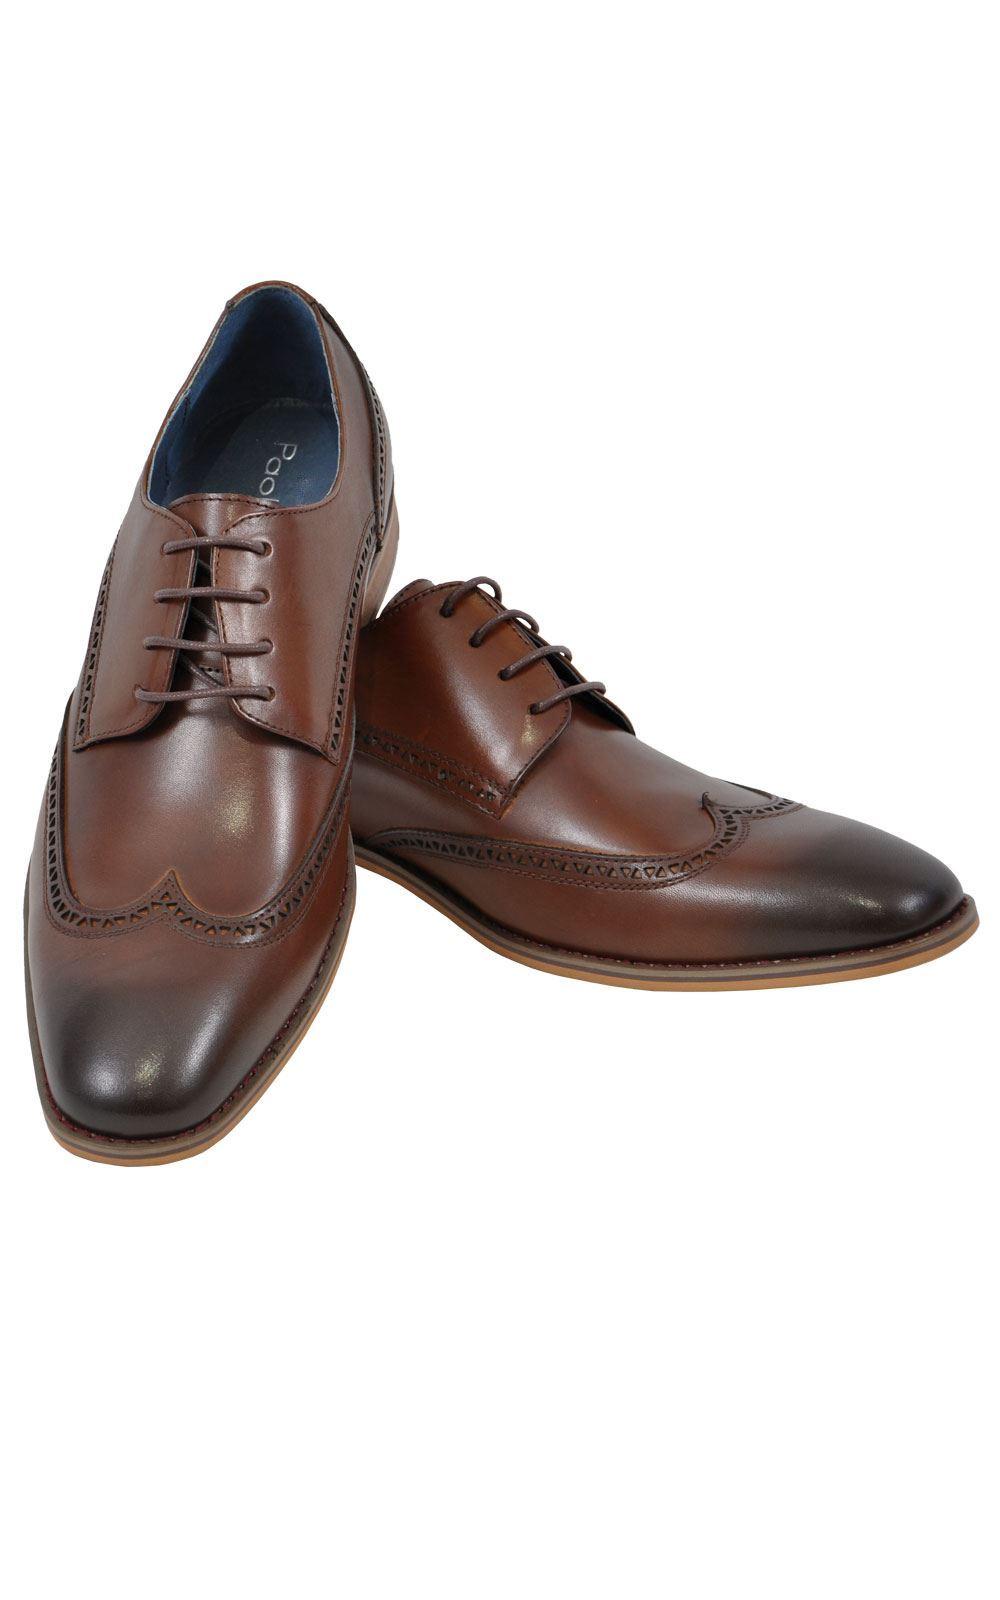 S\u0026T Moore. Paolo Vandini Shoes Thane Brogue